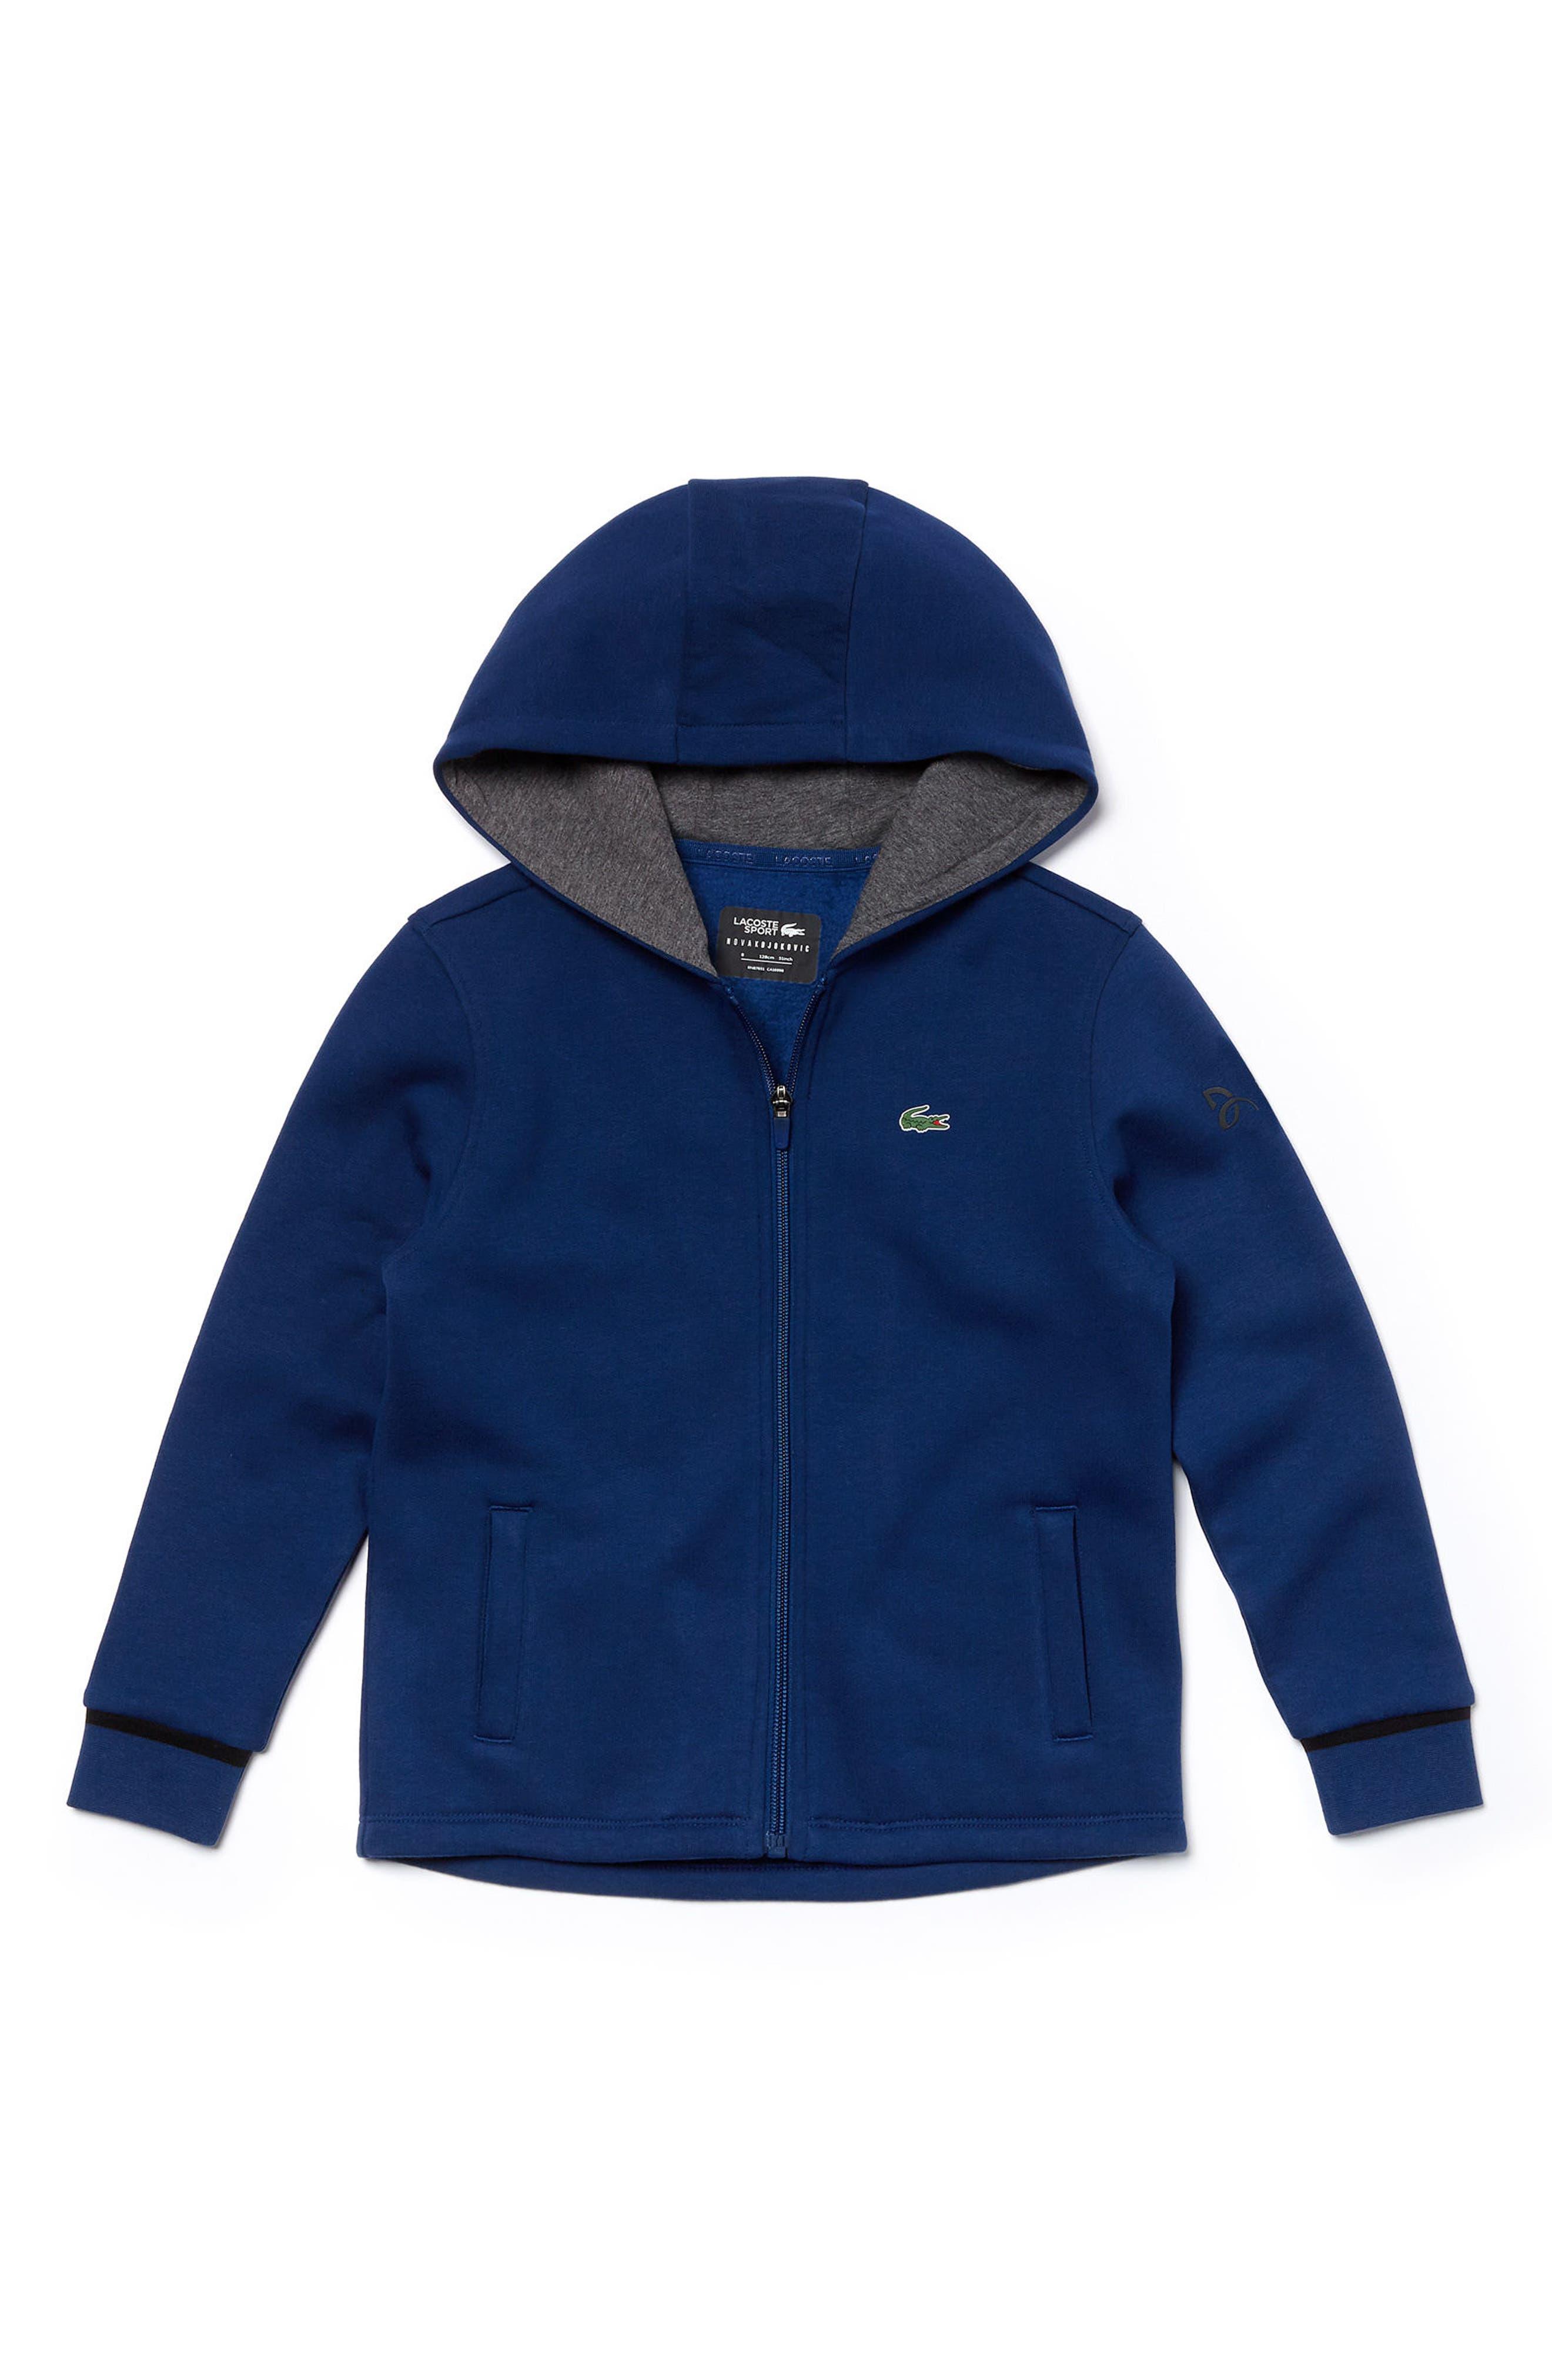 Fan Zip Hoodie,                         Main,                         color, NAVY BLUE/ WHITE